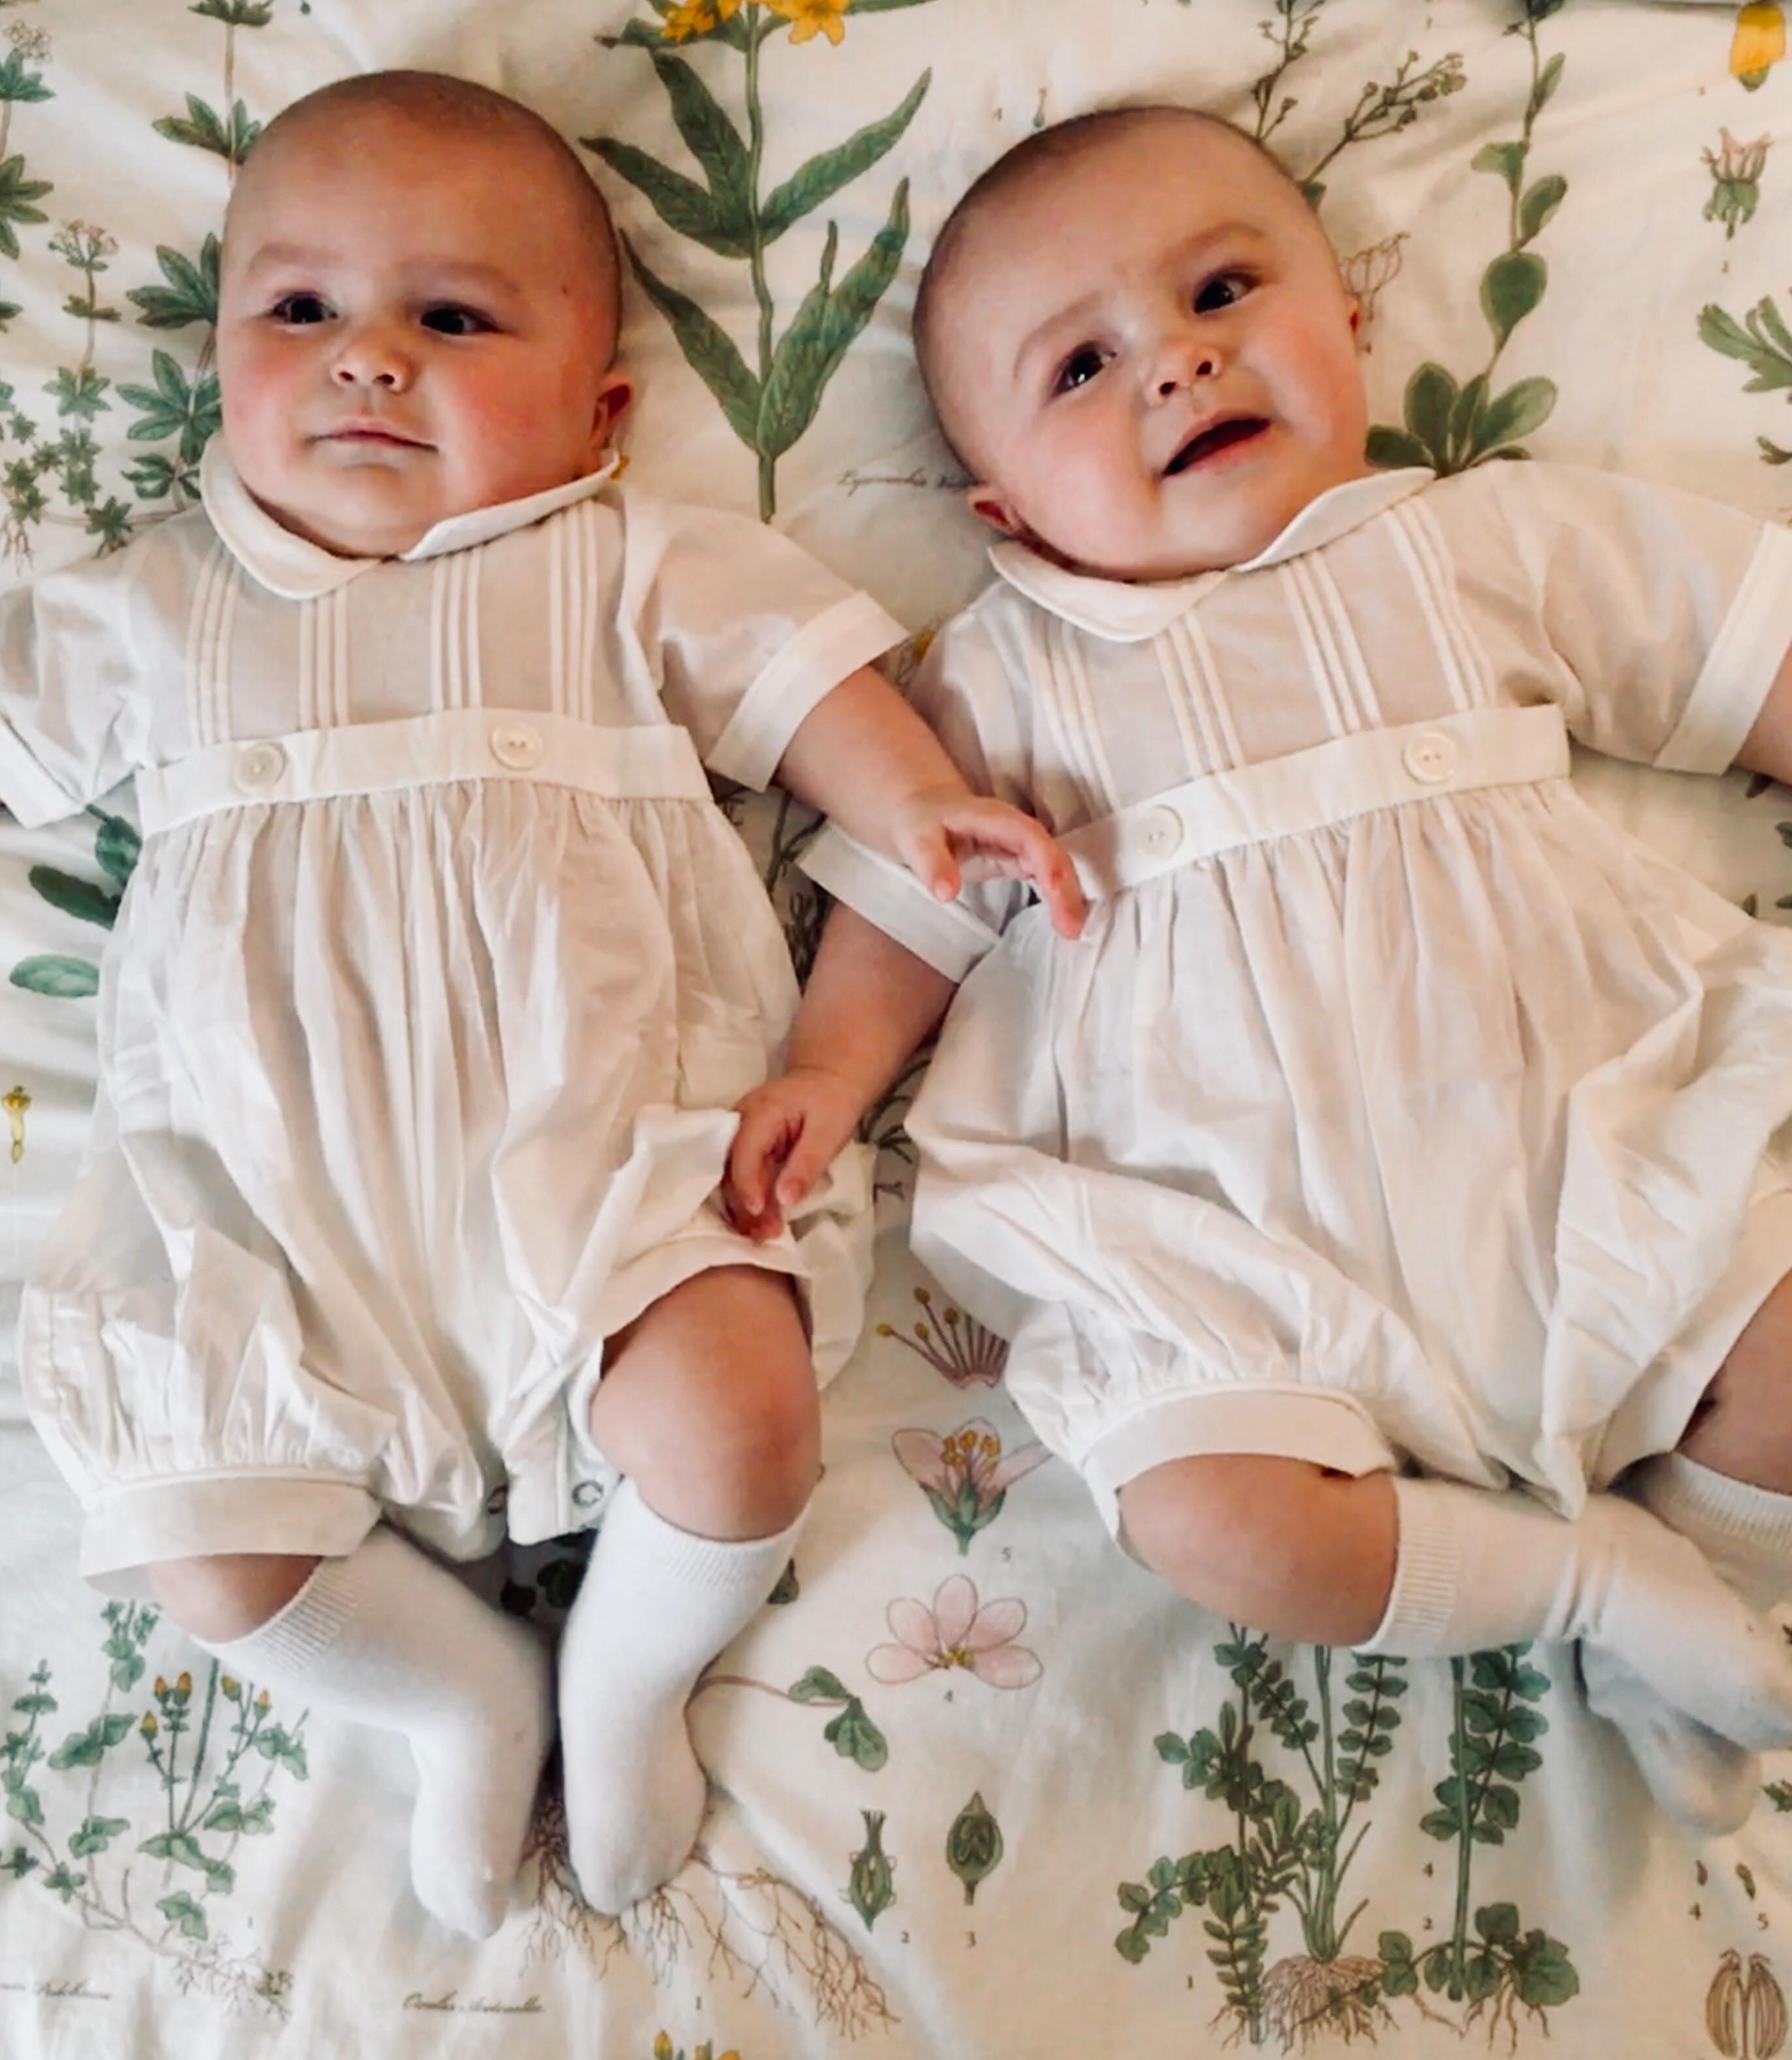 Hank and Huck – Snowflake Babies #554 & #555